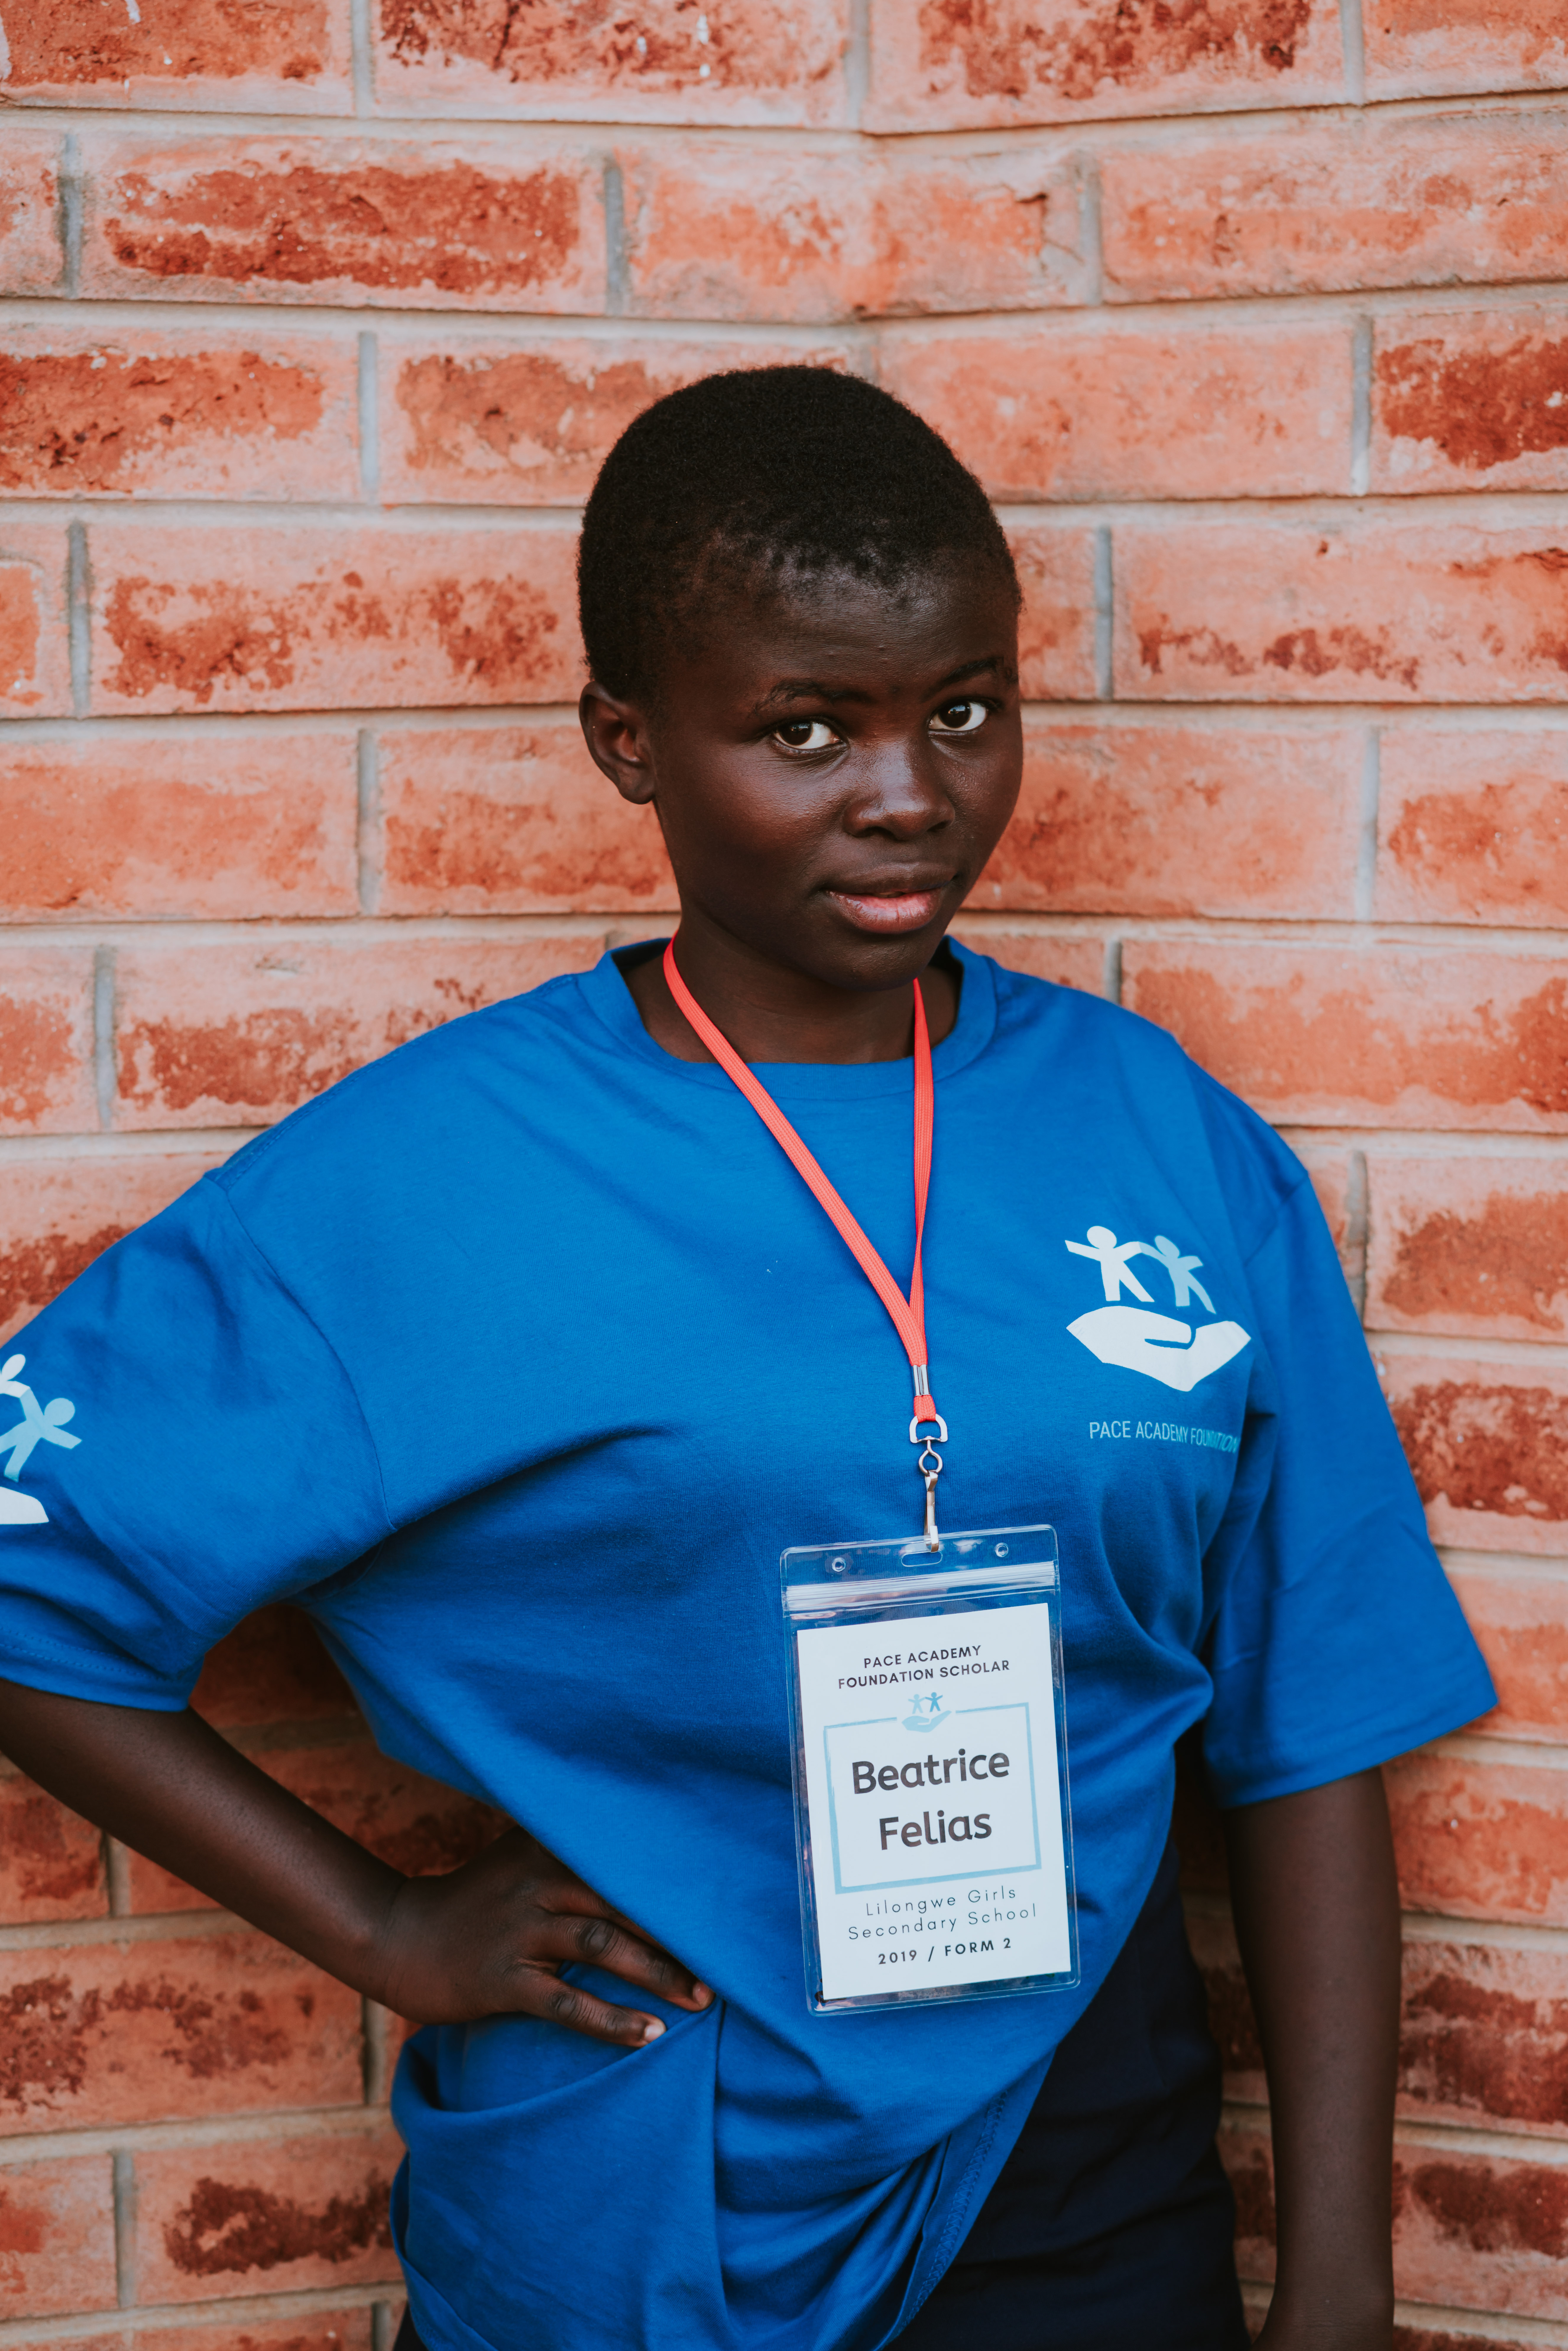 Beatrice Felias (Lilongwe Girls Secondar